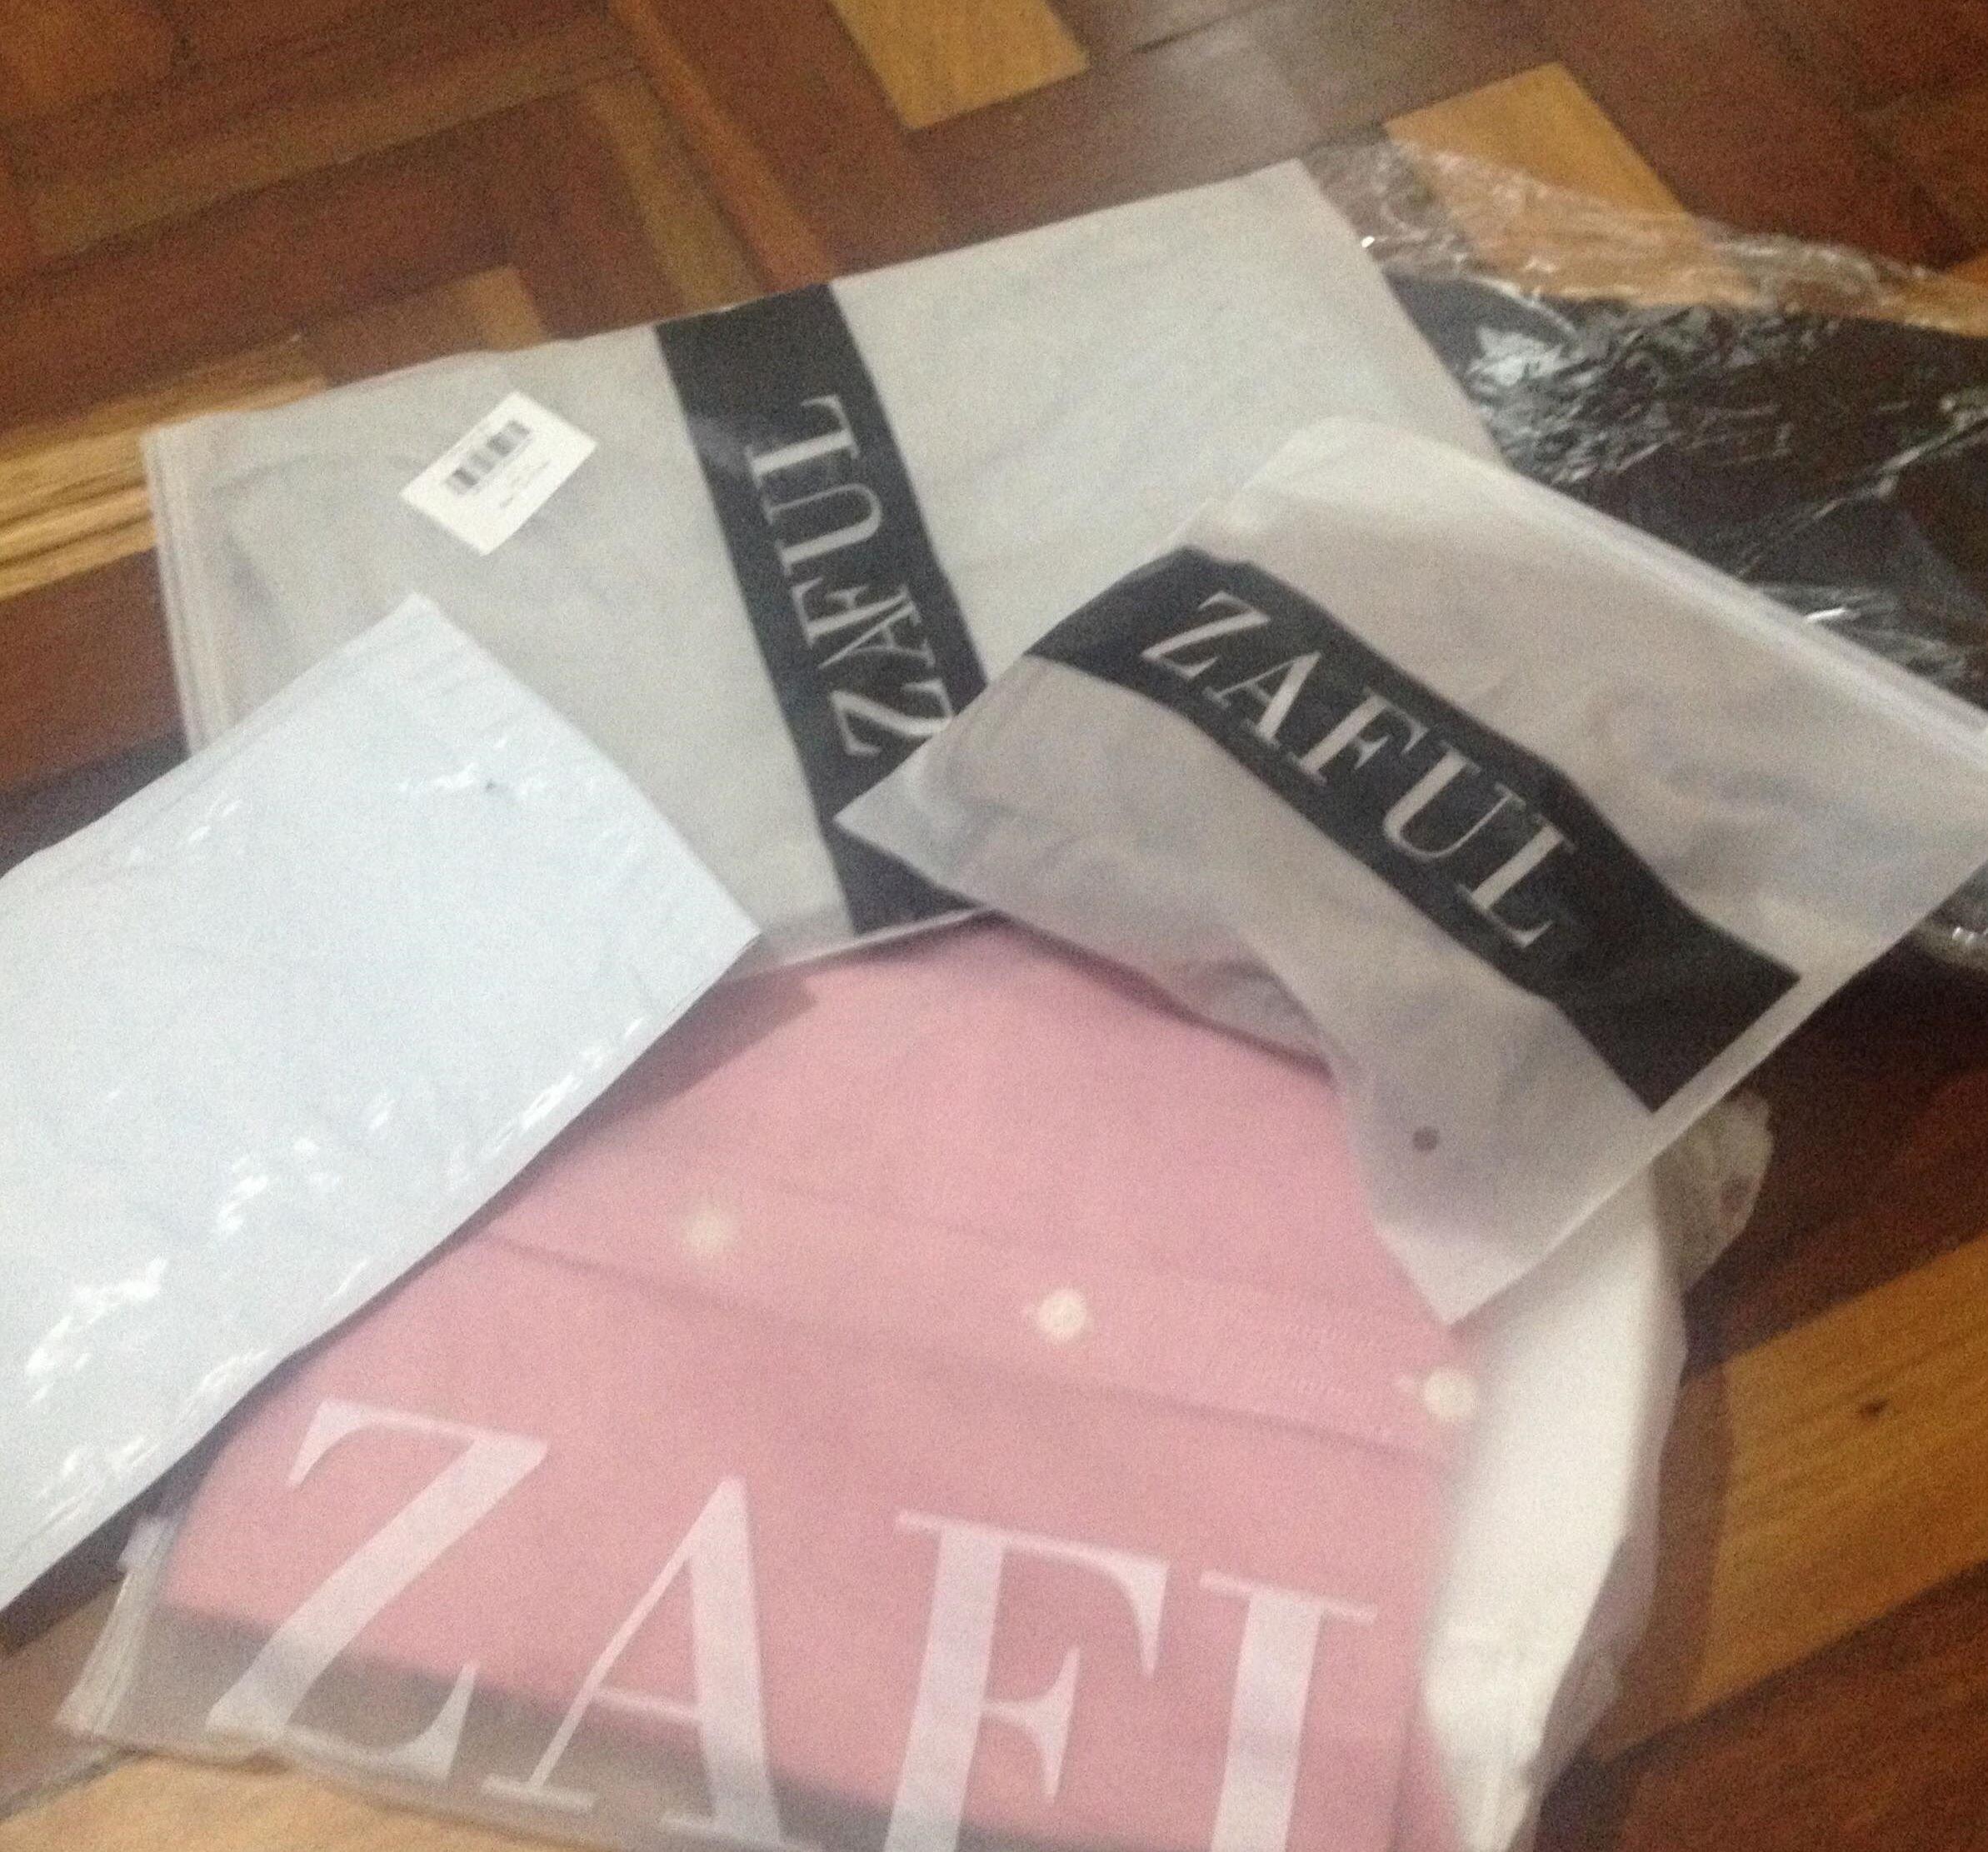 Zaful | Chegou roupa nova